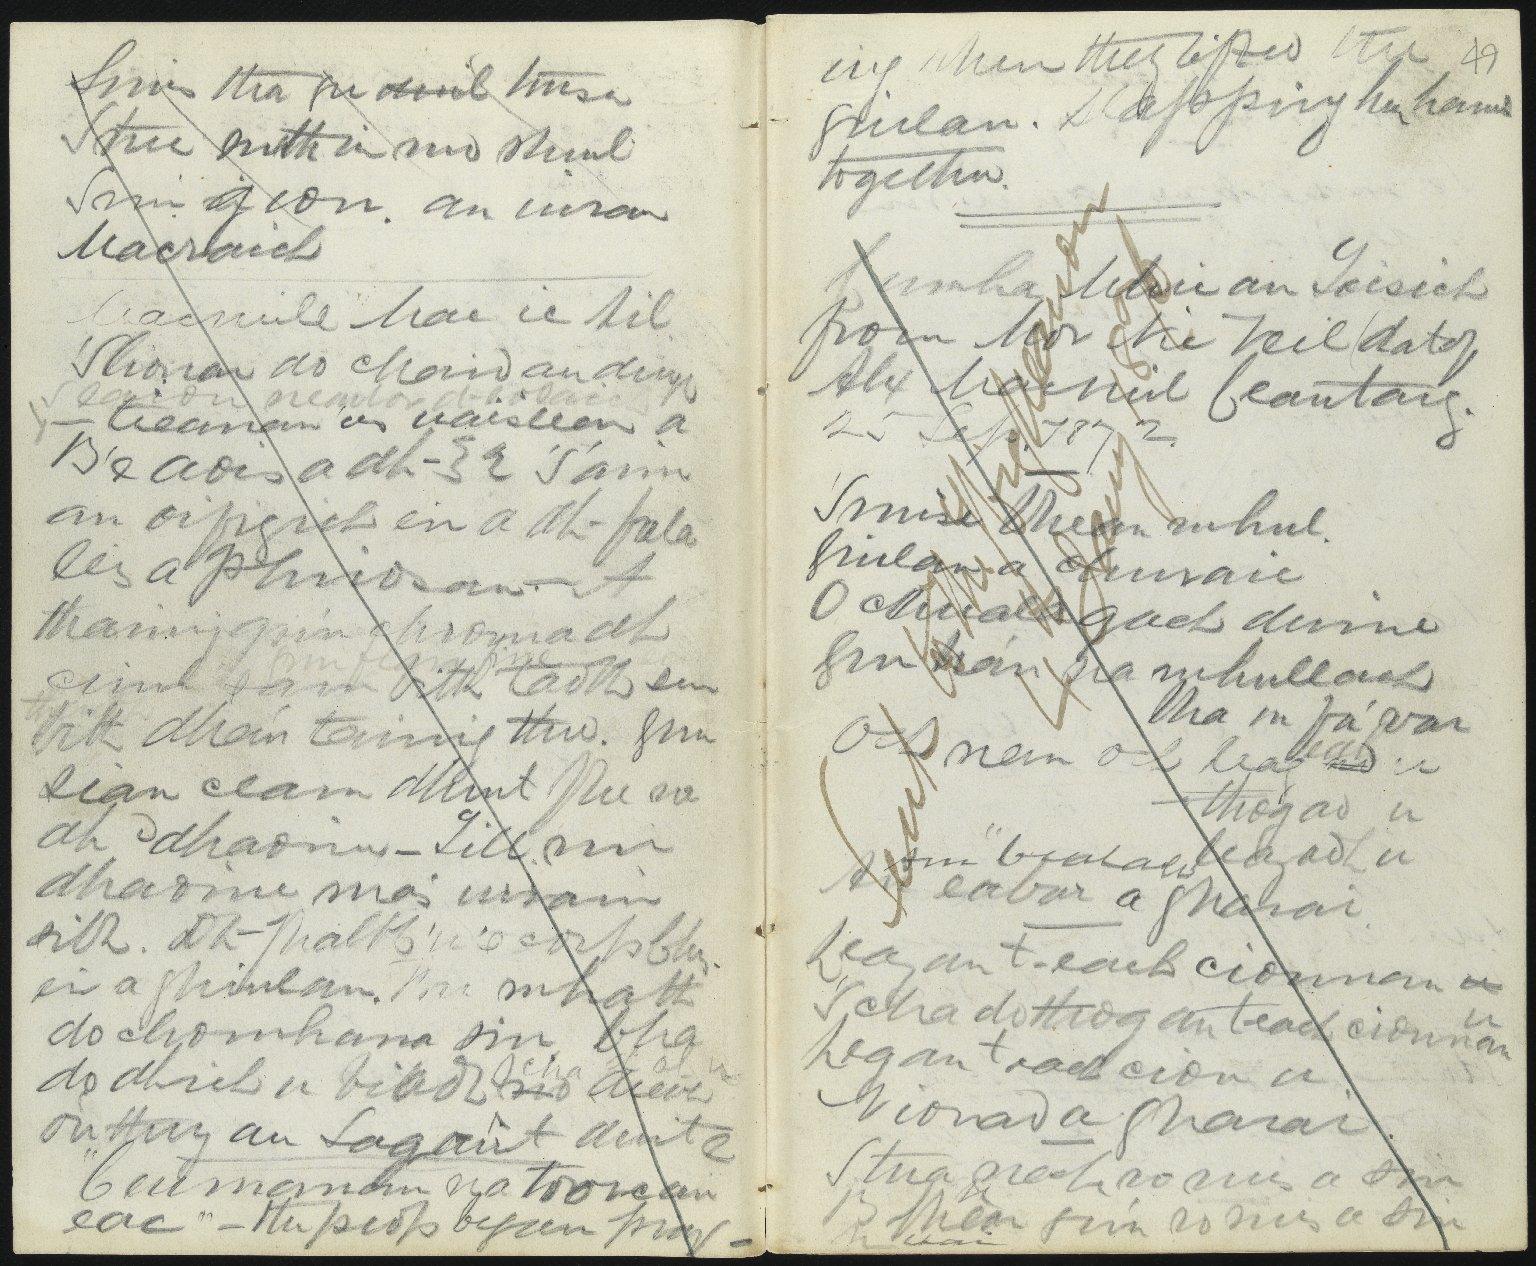 Field Notebook, ff.48v-49r